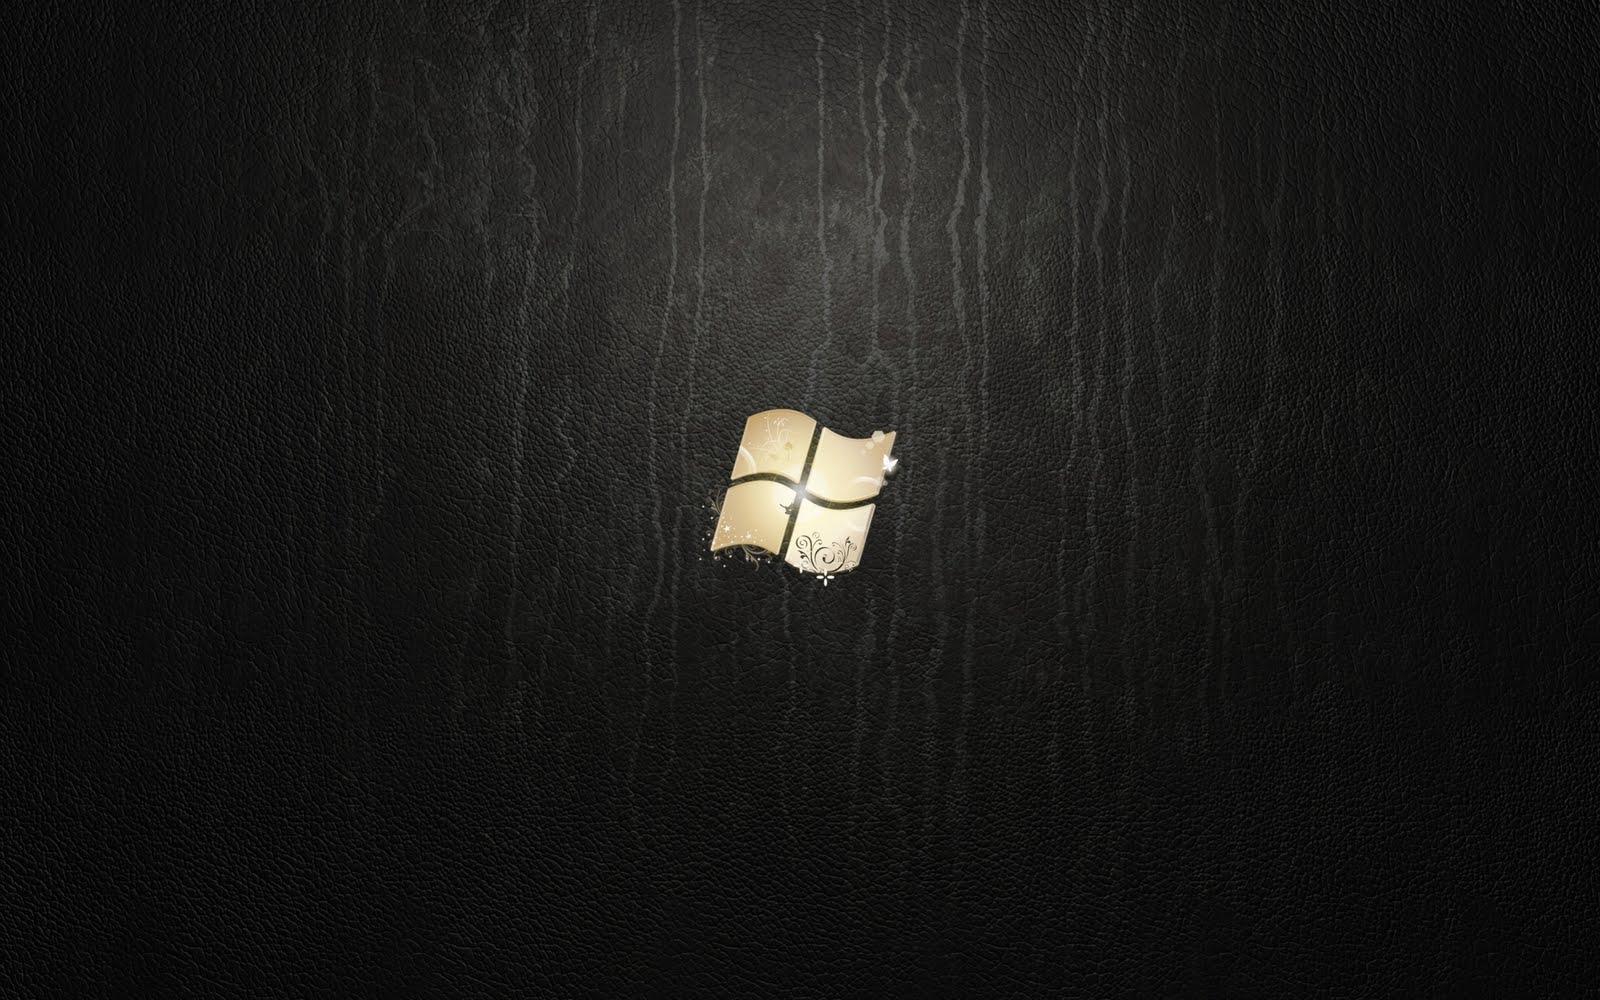 Windows 7 Black HD Desktop